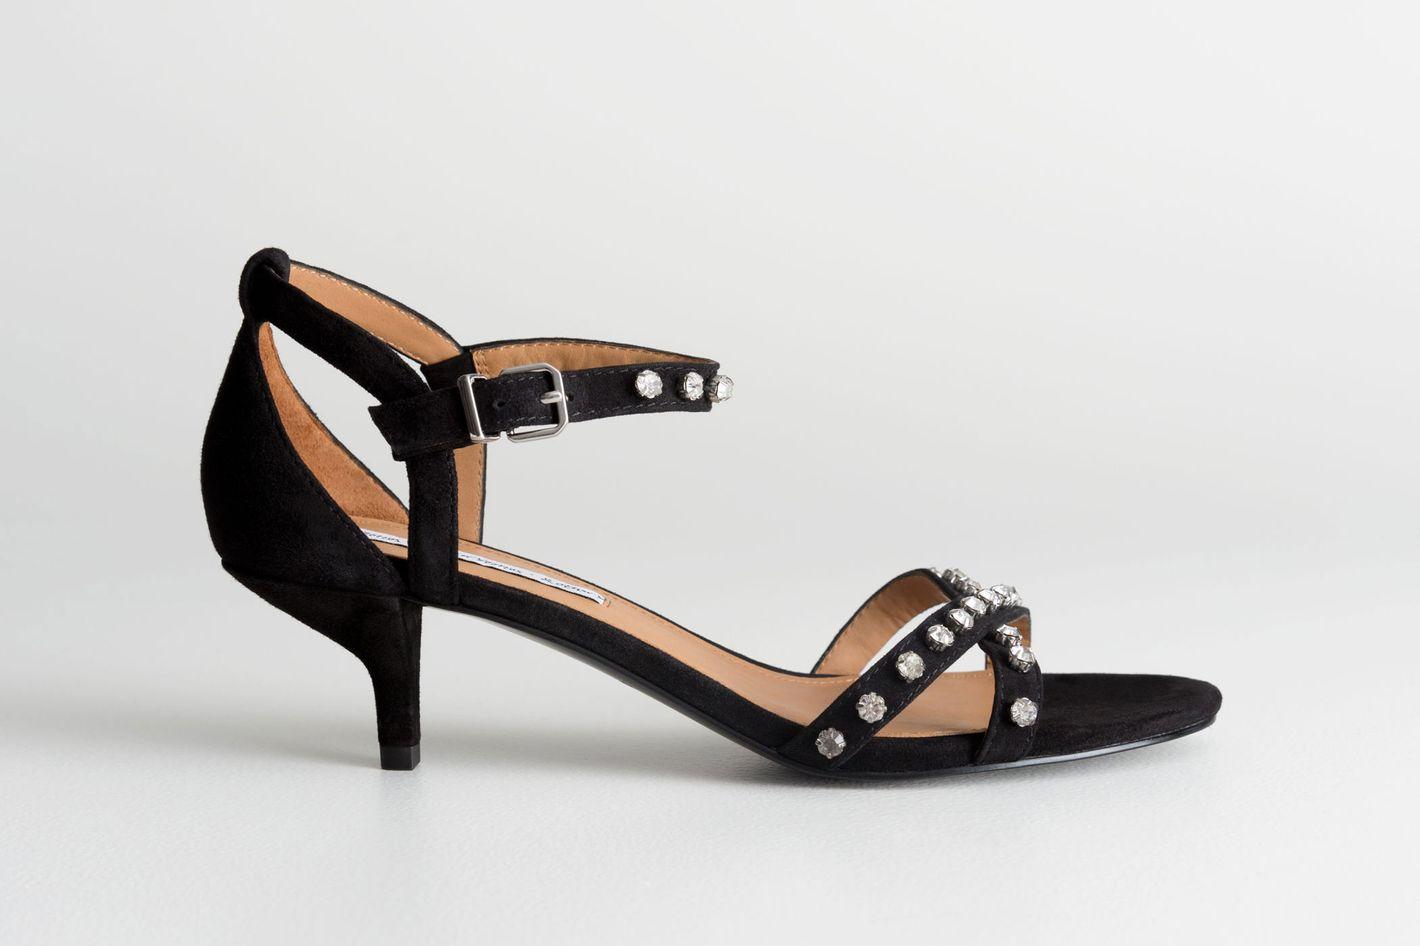 Rhinstone Studded Kitten Heels